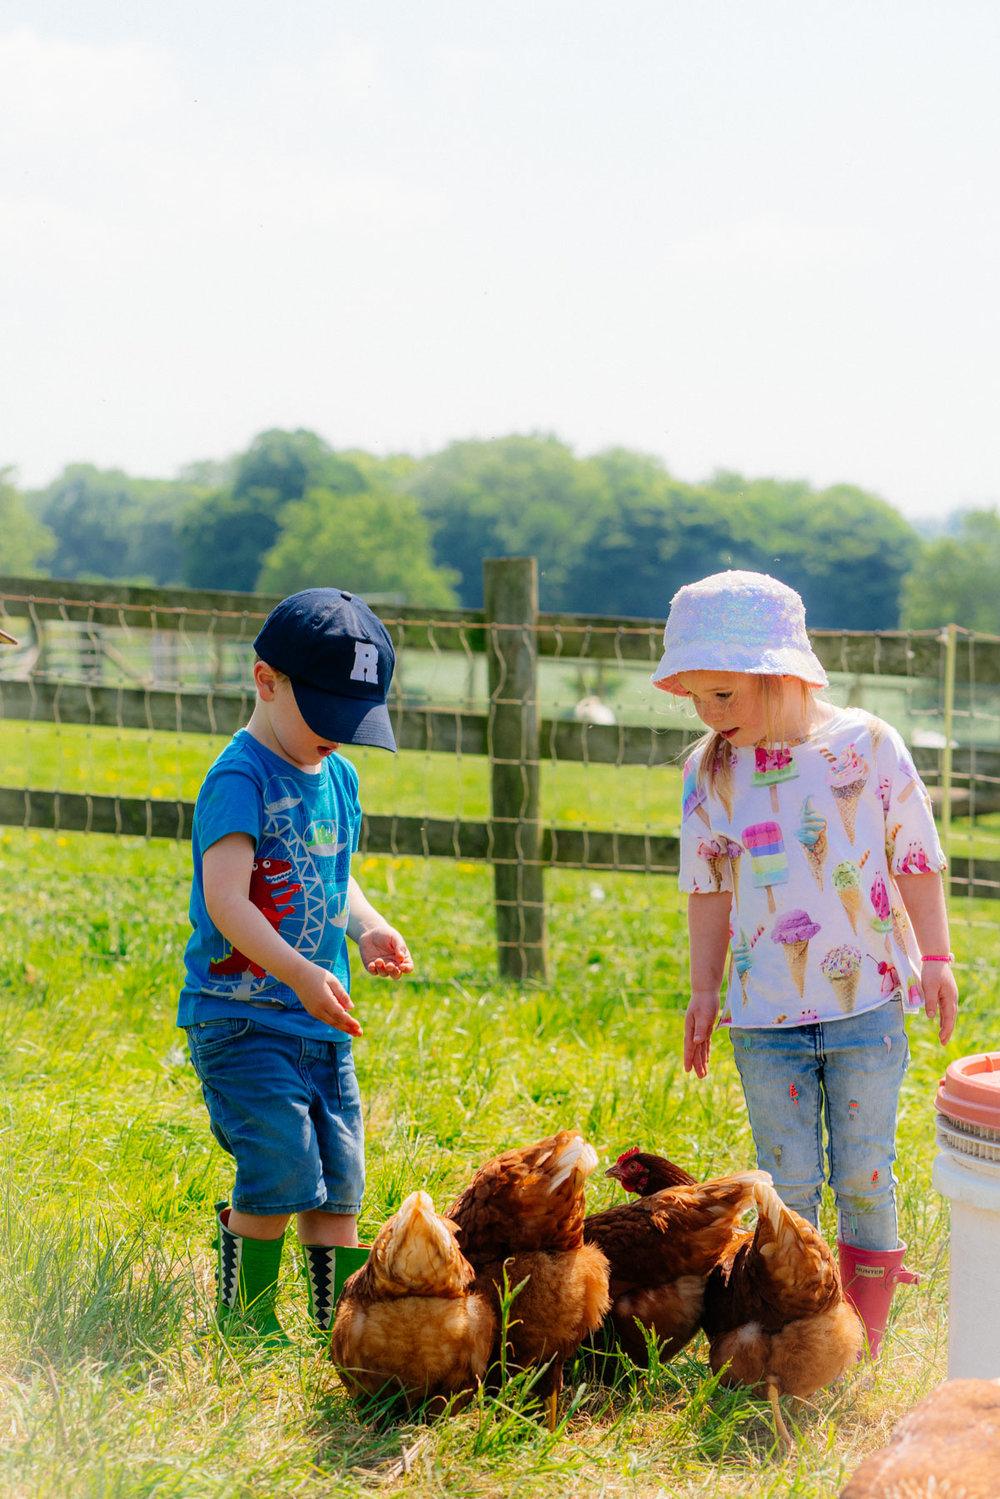 warleigh-lodge-farm-grosvenor-2018-05-22---305-305.jpg